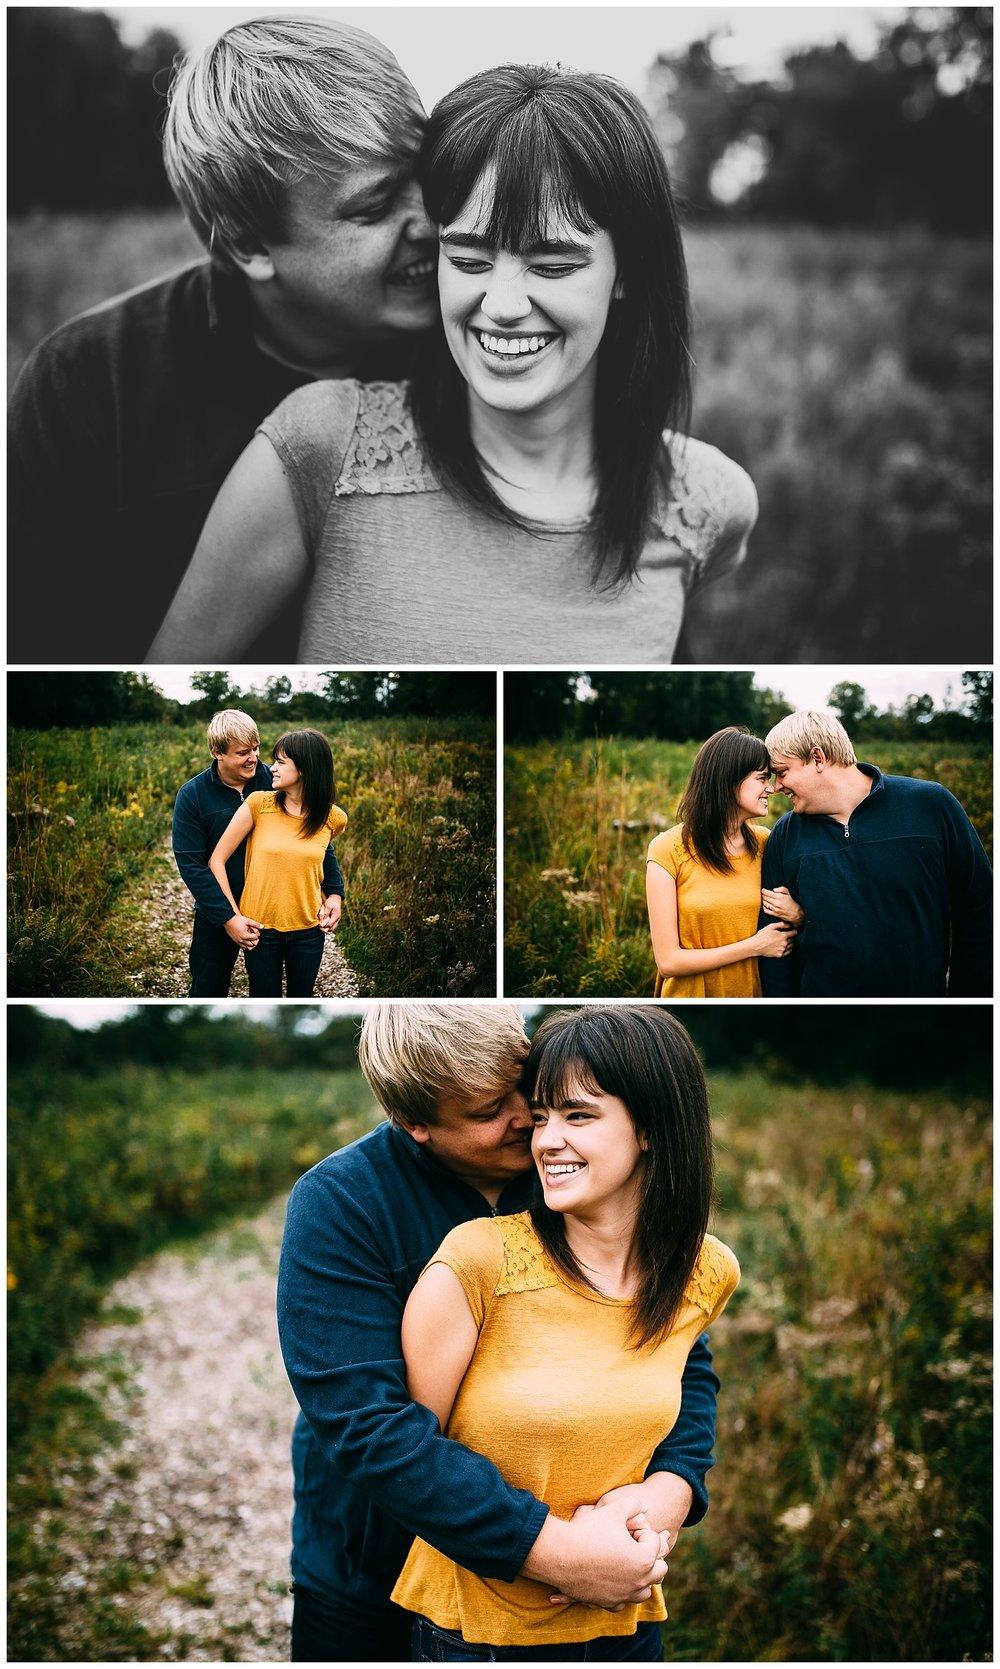 Marissa-Austin-Engaged-Michigan-Wedding-Photographer-8070.jpg